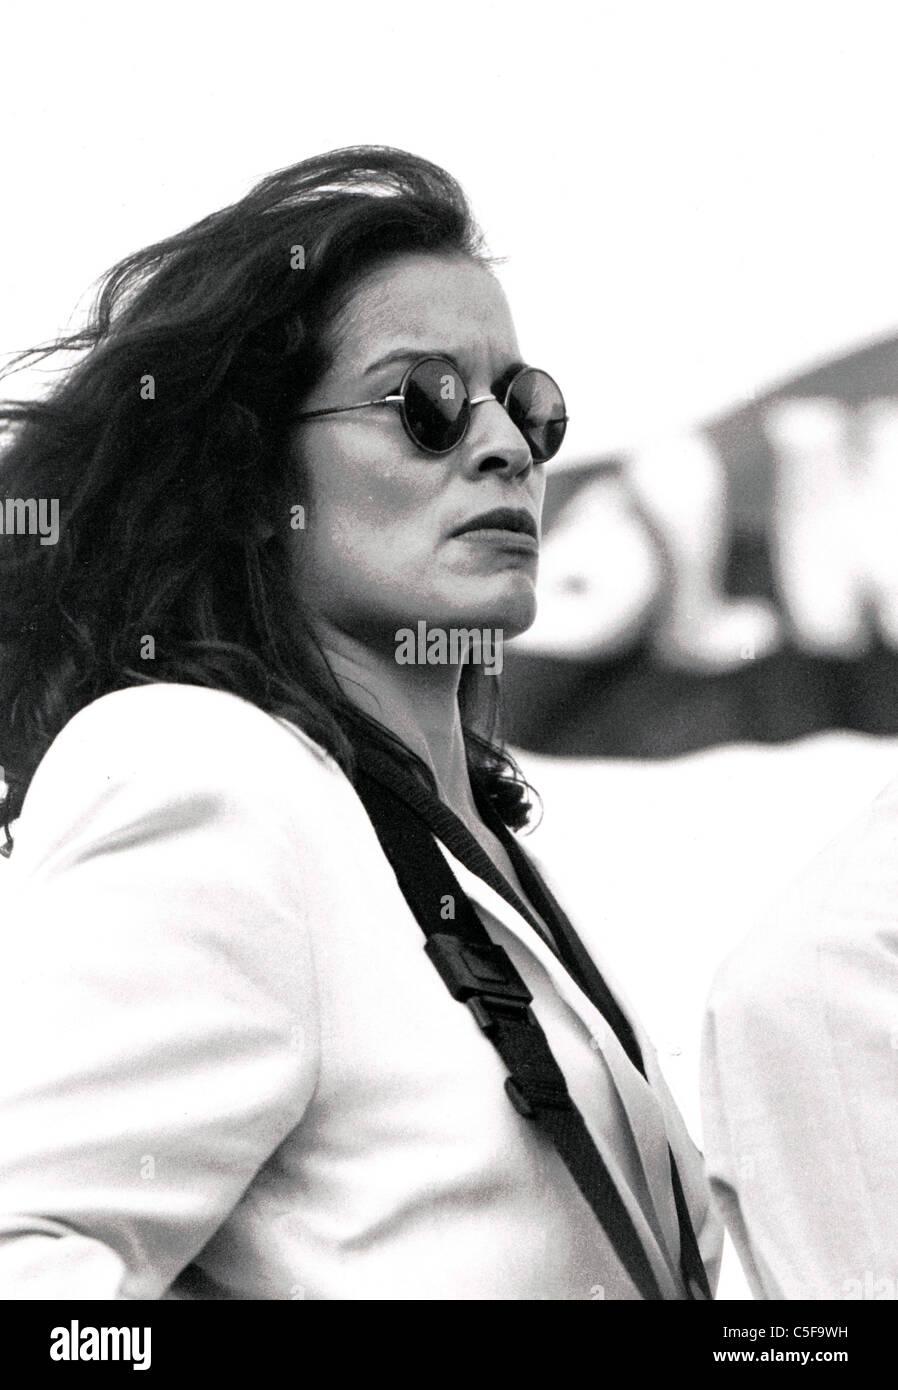 Ms. Bianca Jagger, Rolling Stone Mick Jagger ex-partner and humanitarian ambassador - Stock Image